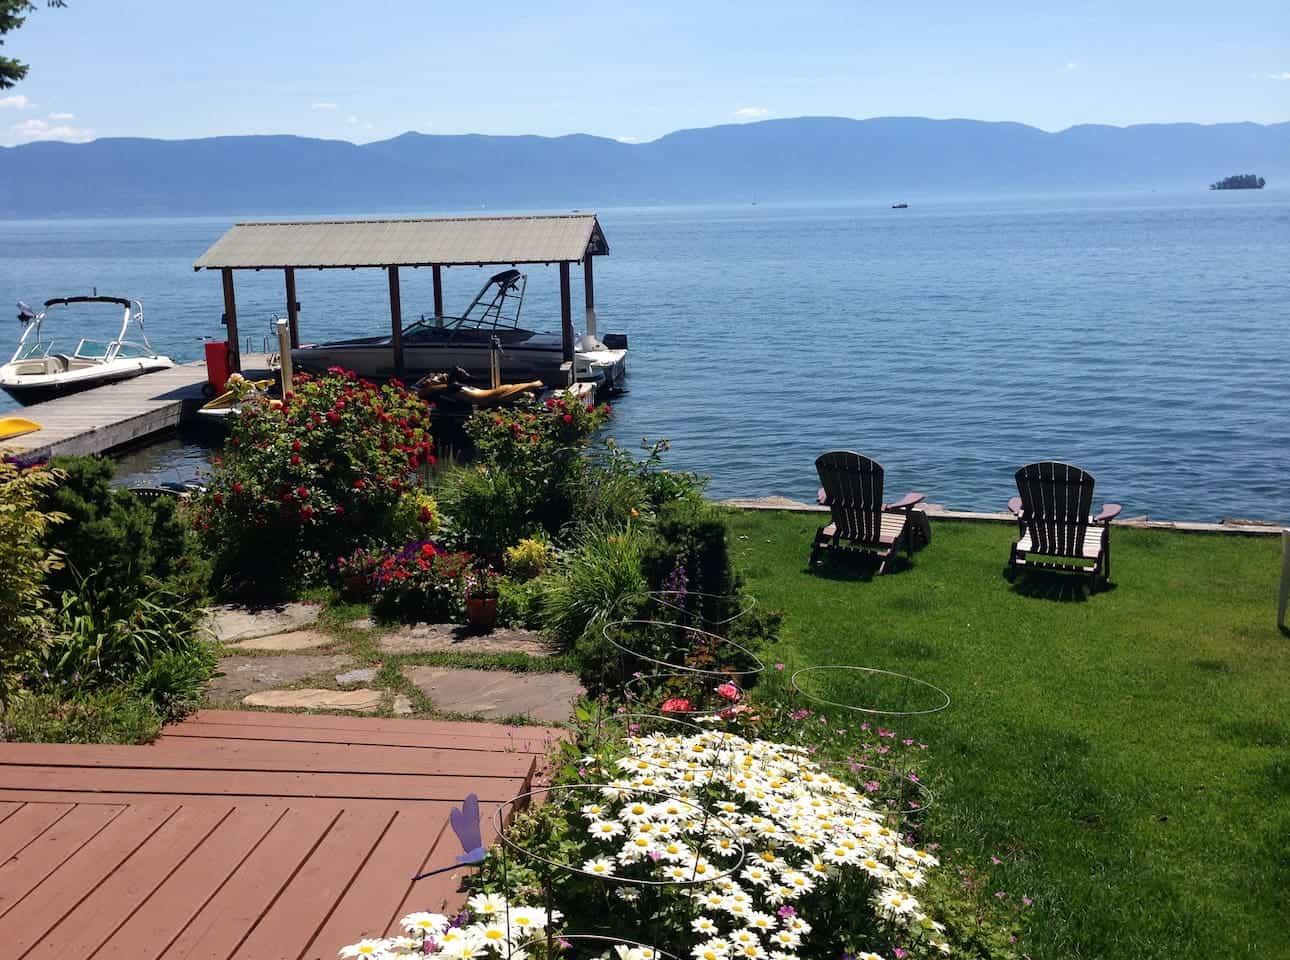 Image of Airbnb rental in Flathead Lake